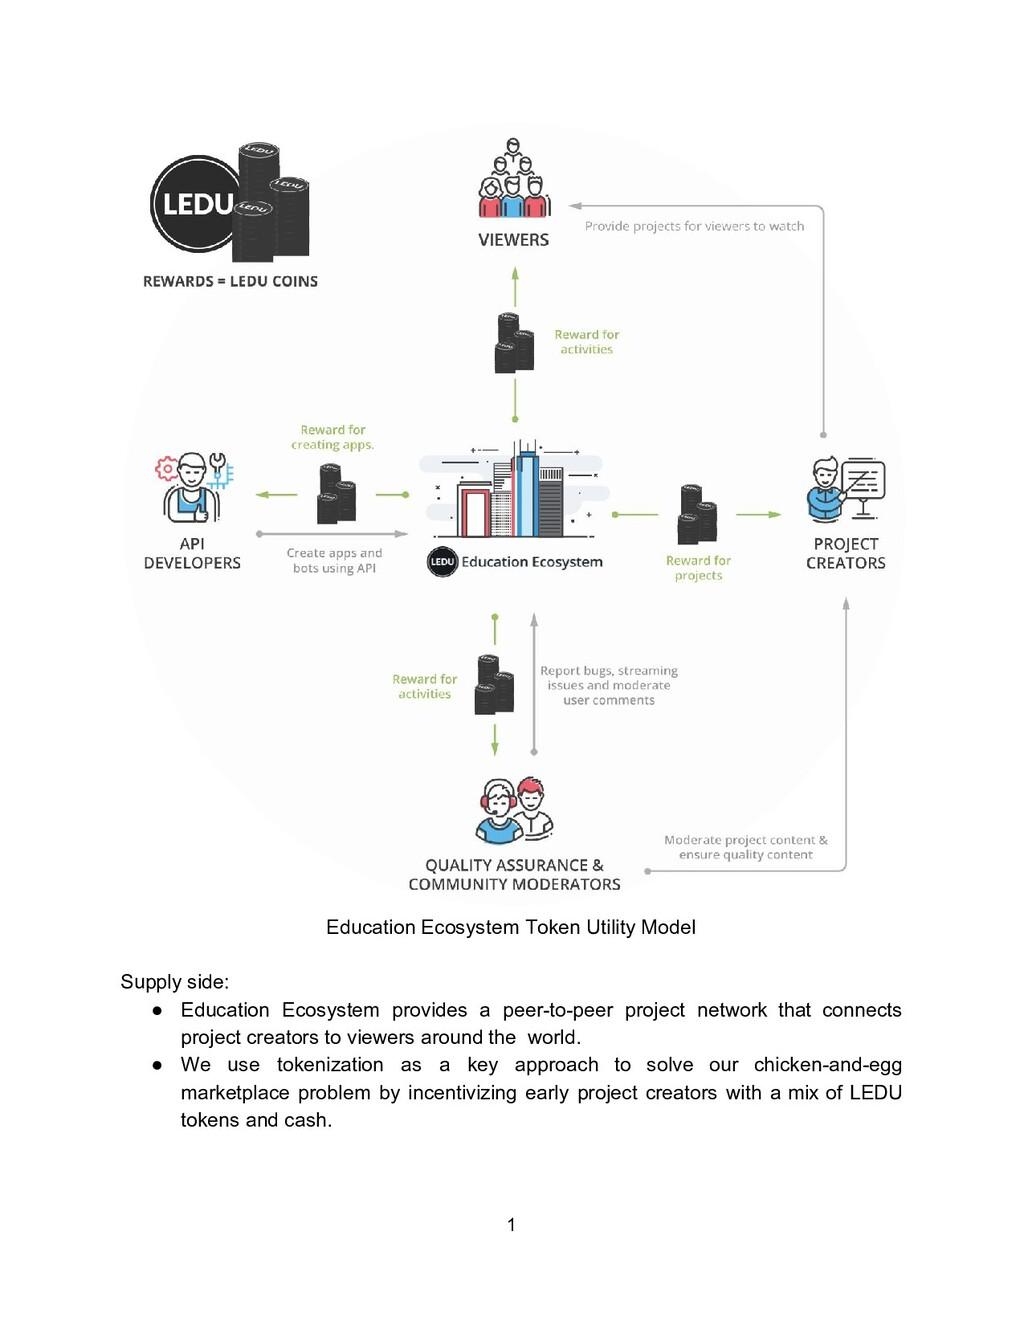 Education Ecosystem Token Utility Model Supply ...